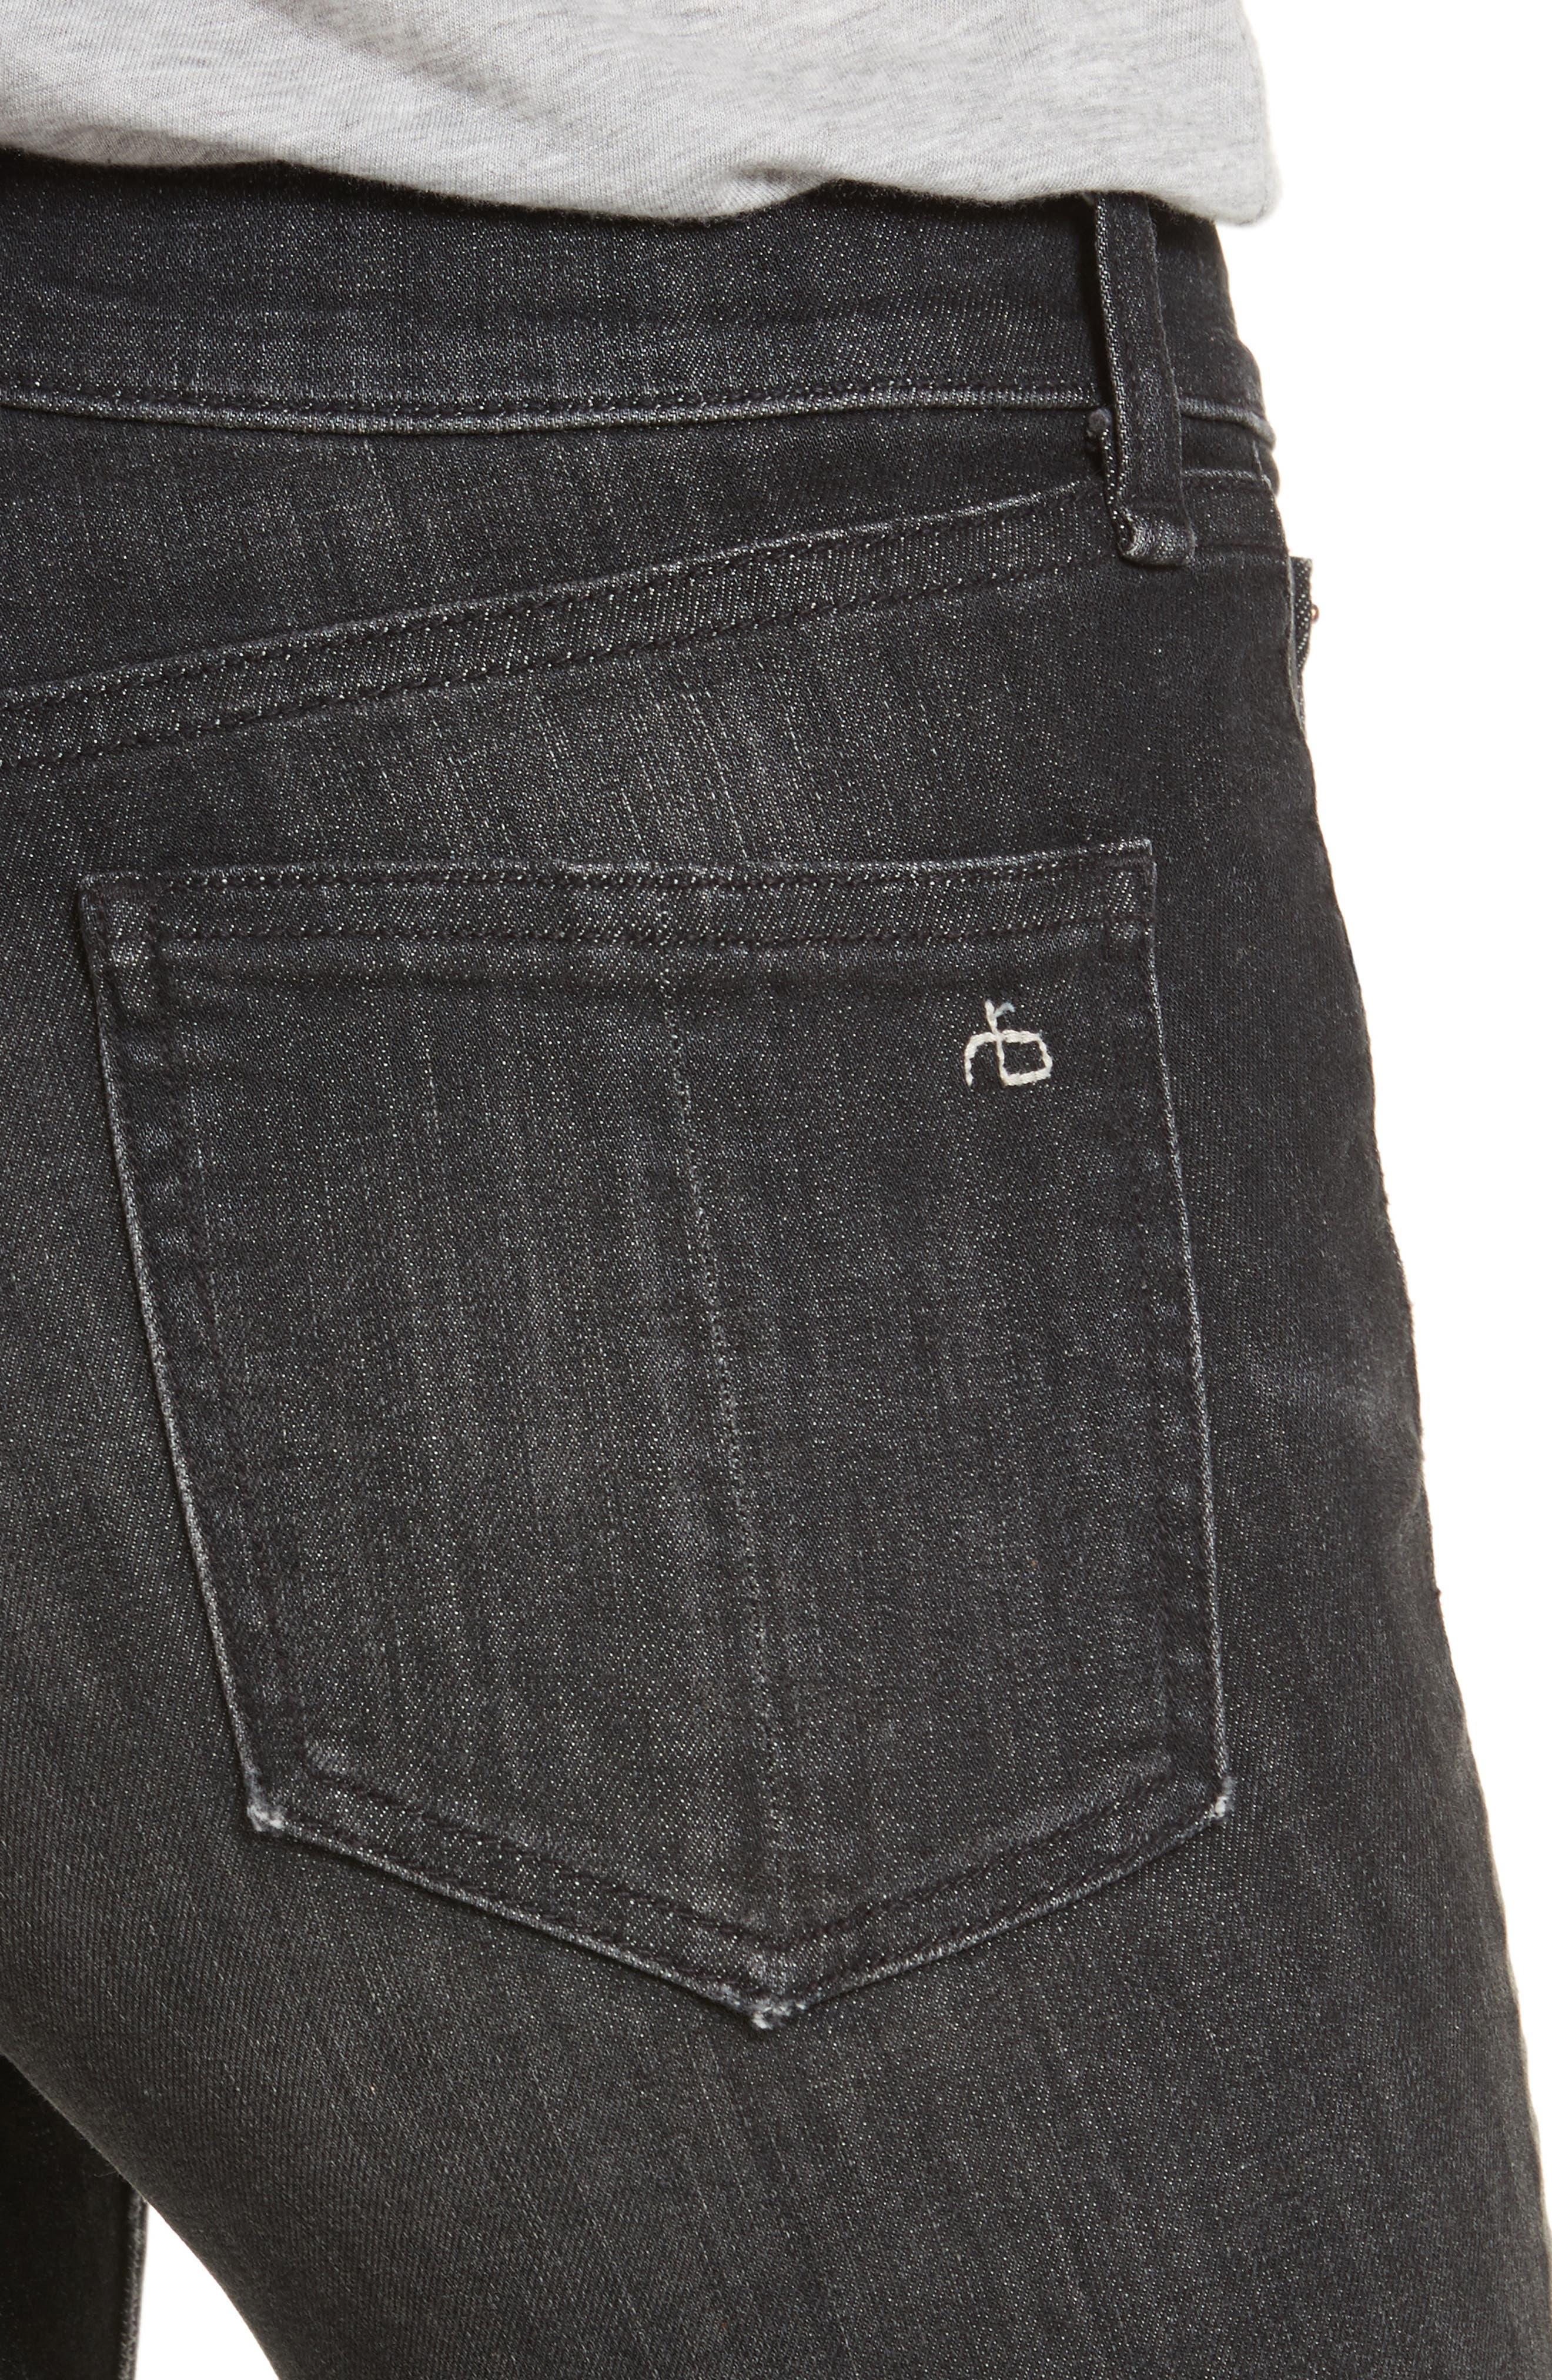 Alternate Image 4  - rag & bone/JEAN High Waist Ankle Skinny Jeans (Black Lock)